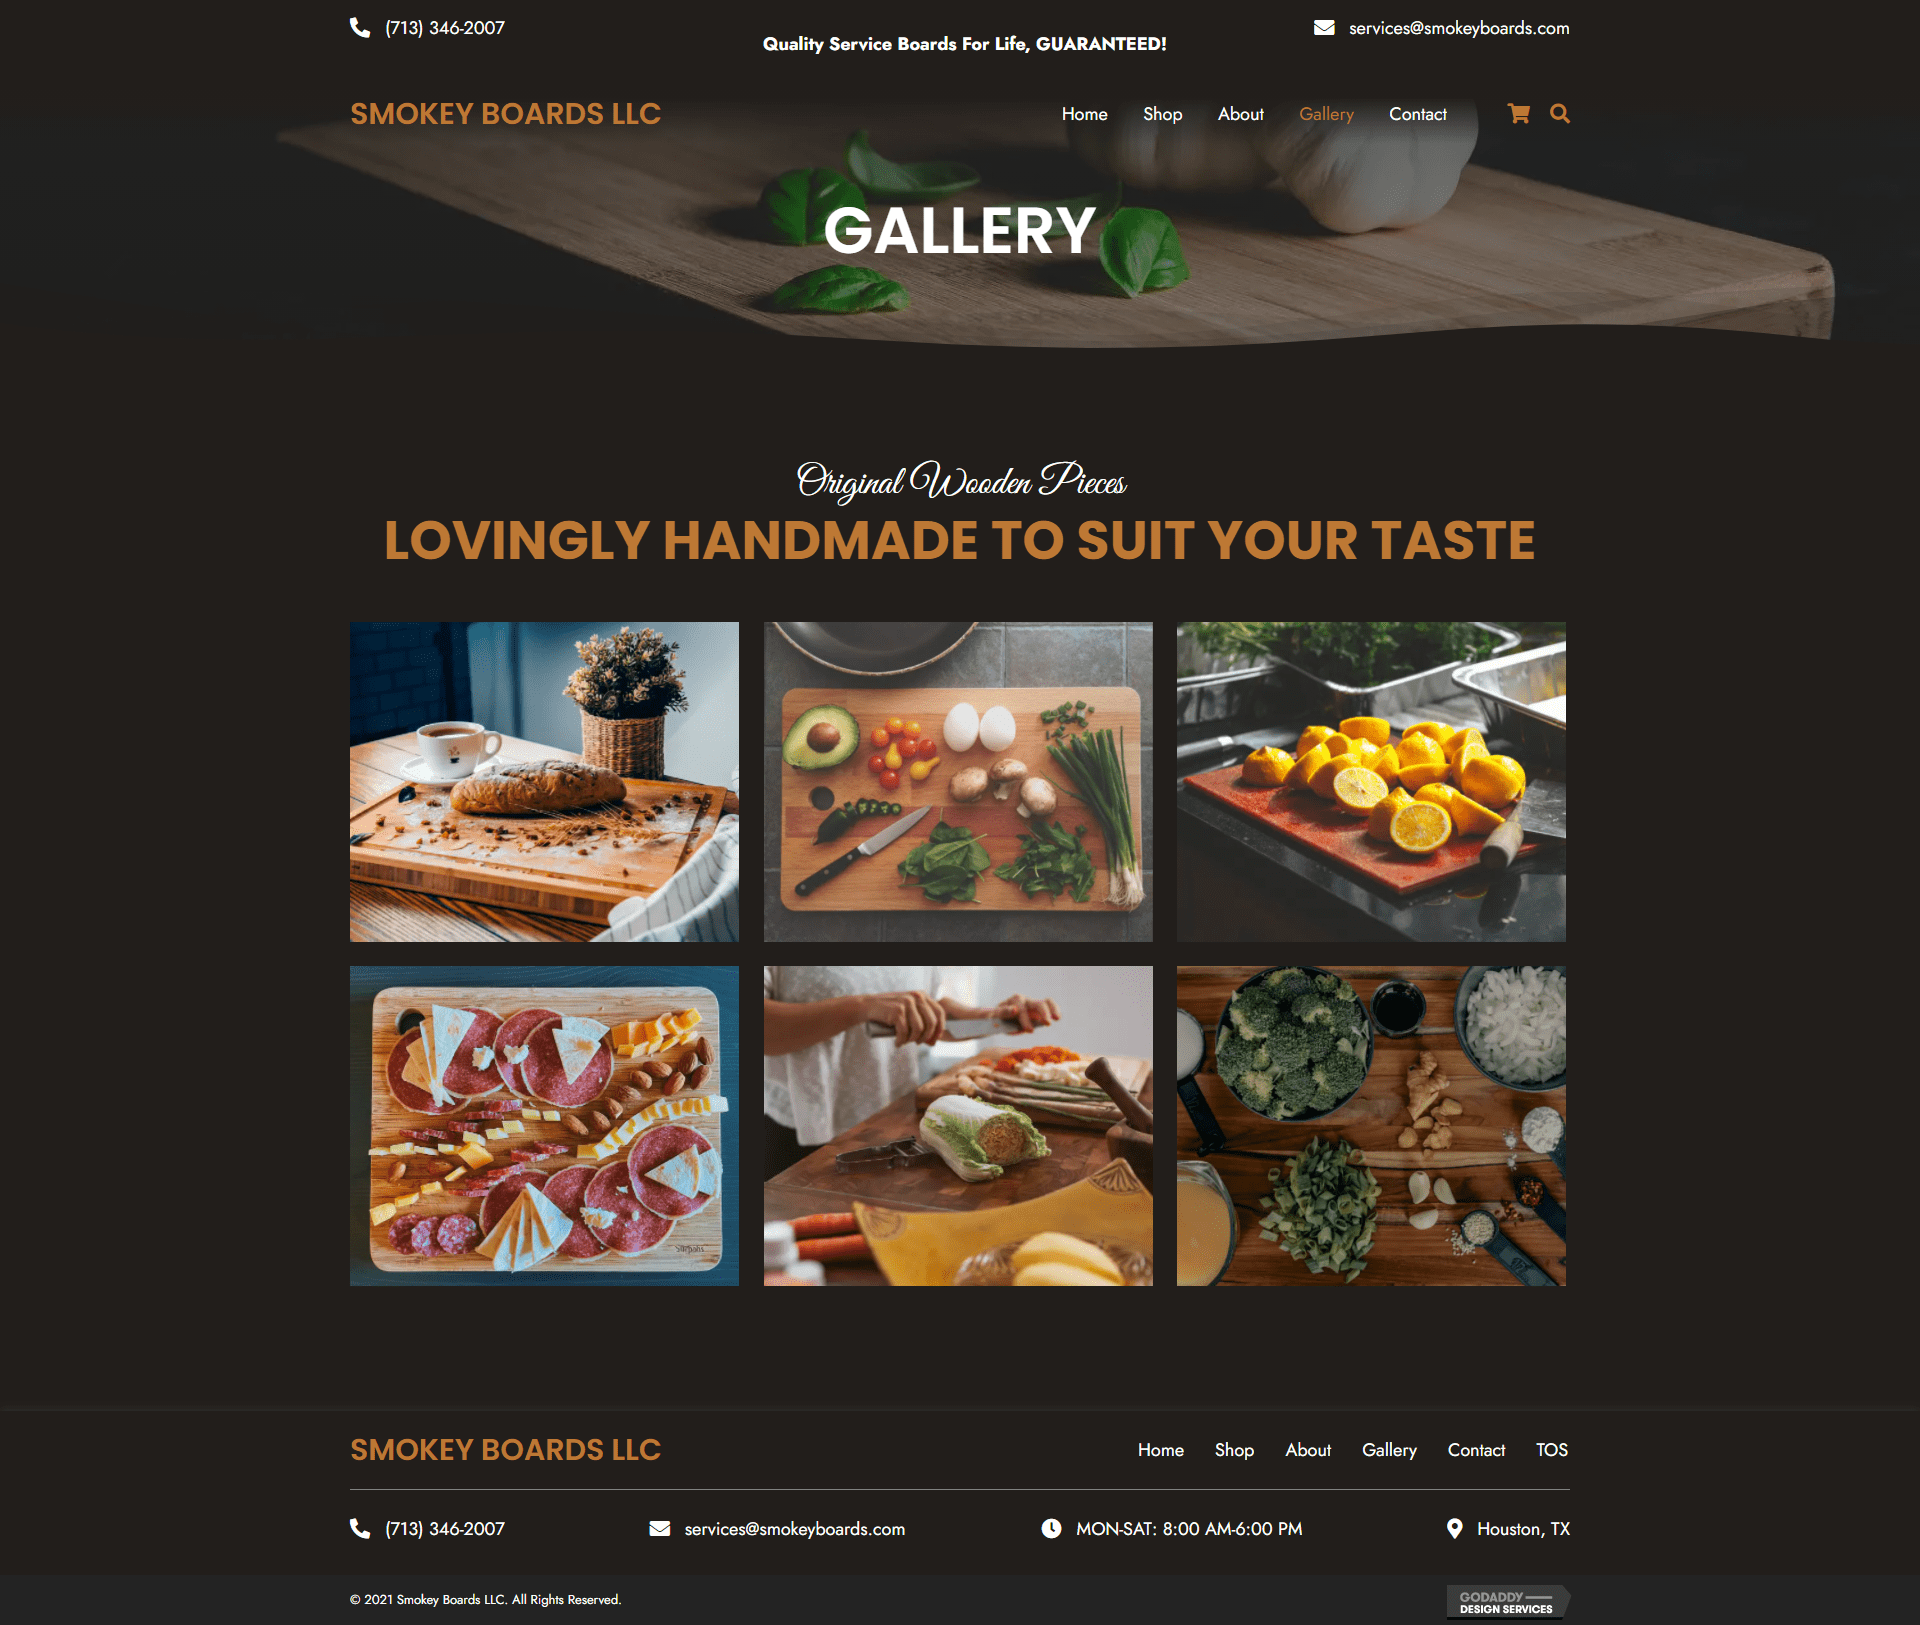 Smokey Boards LLC Gallery